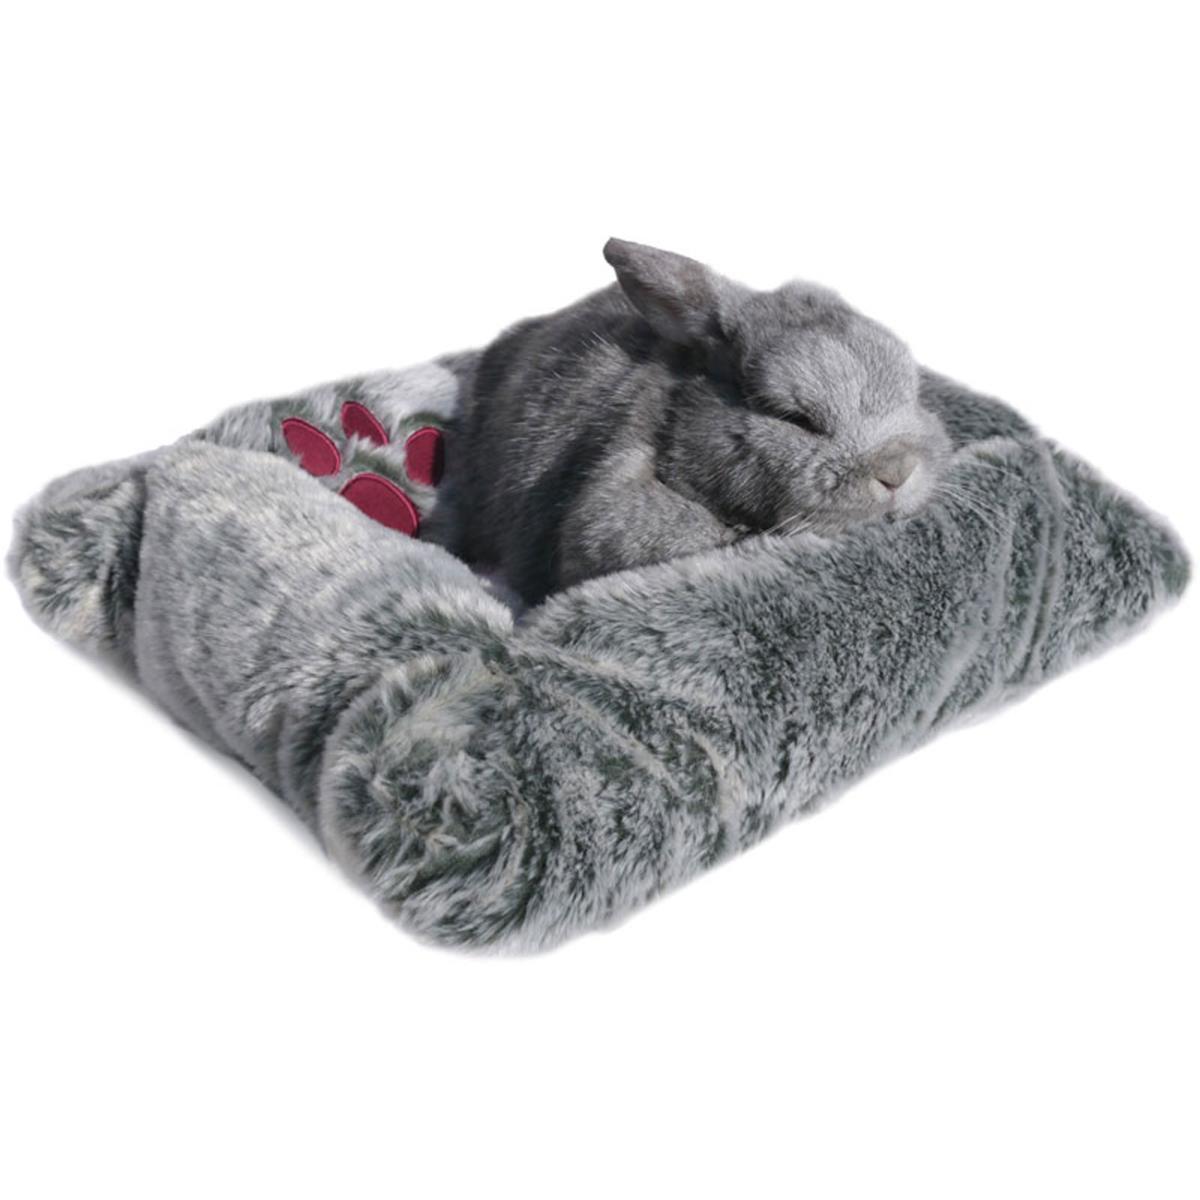 Rosewood Luxury Plush Bed